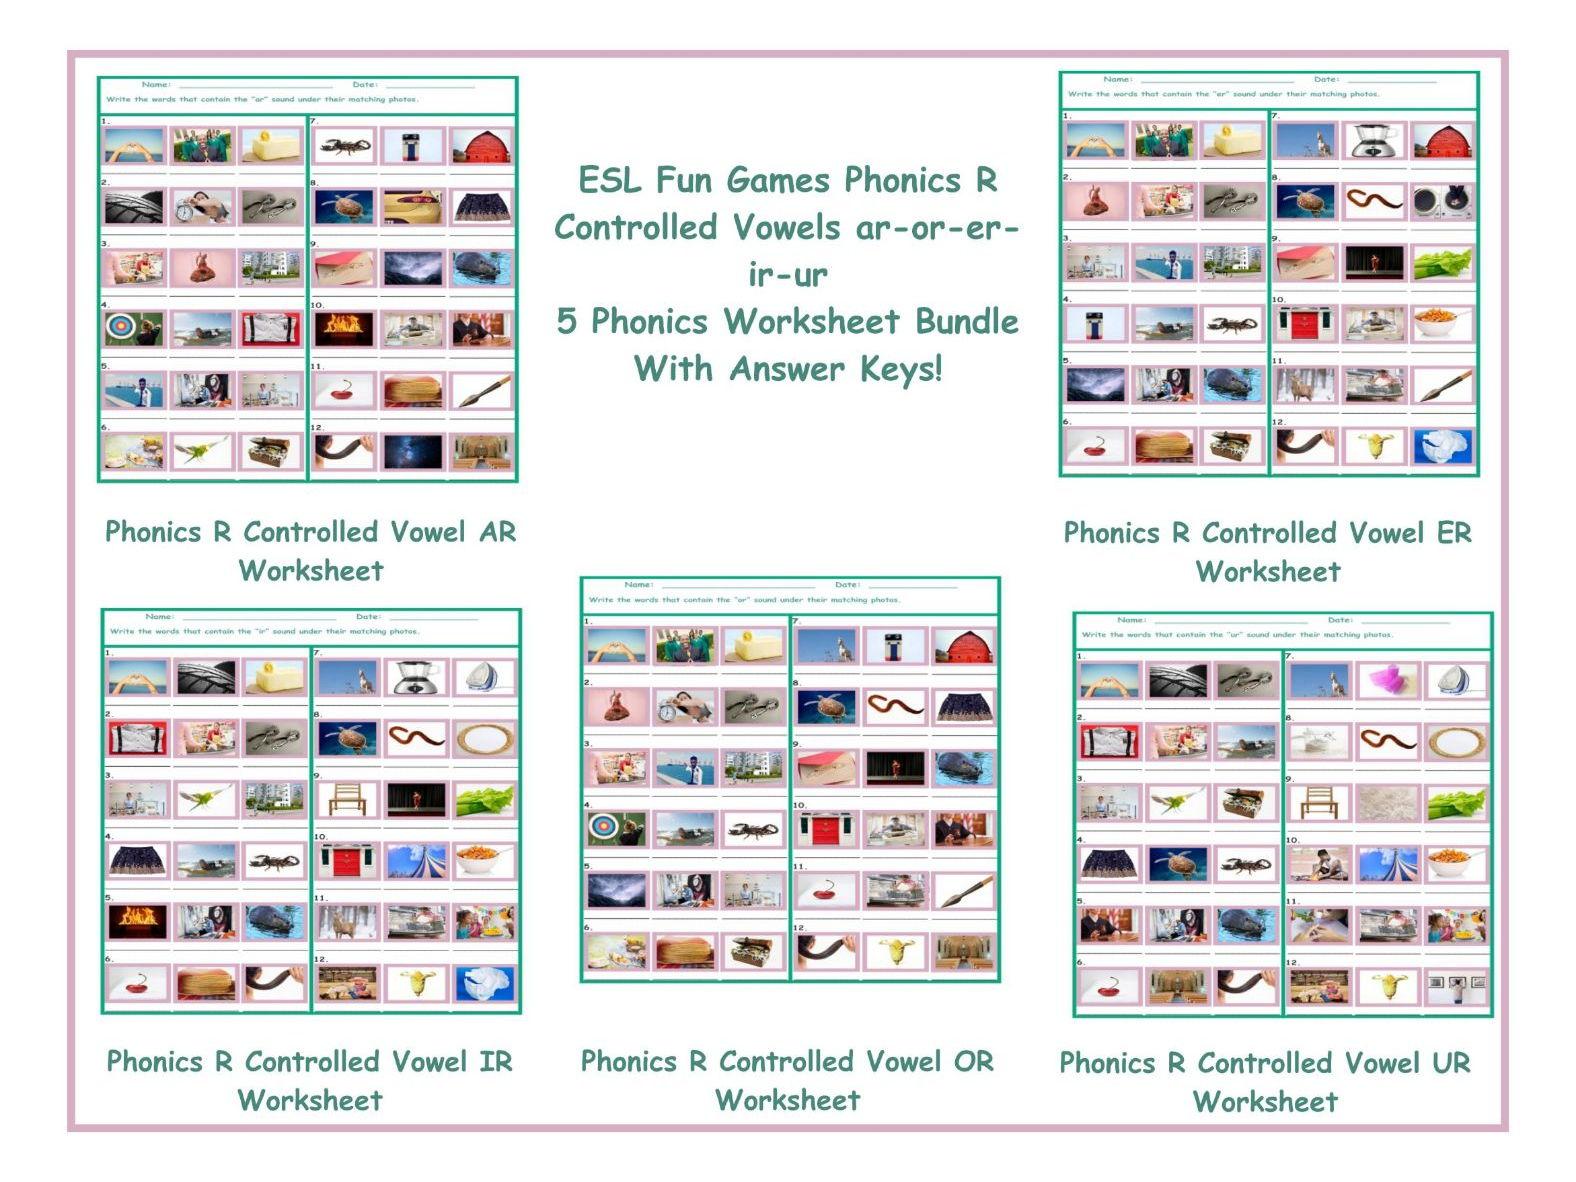 Phonics R Controlled Vowels Ar Worksheets Samples